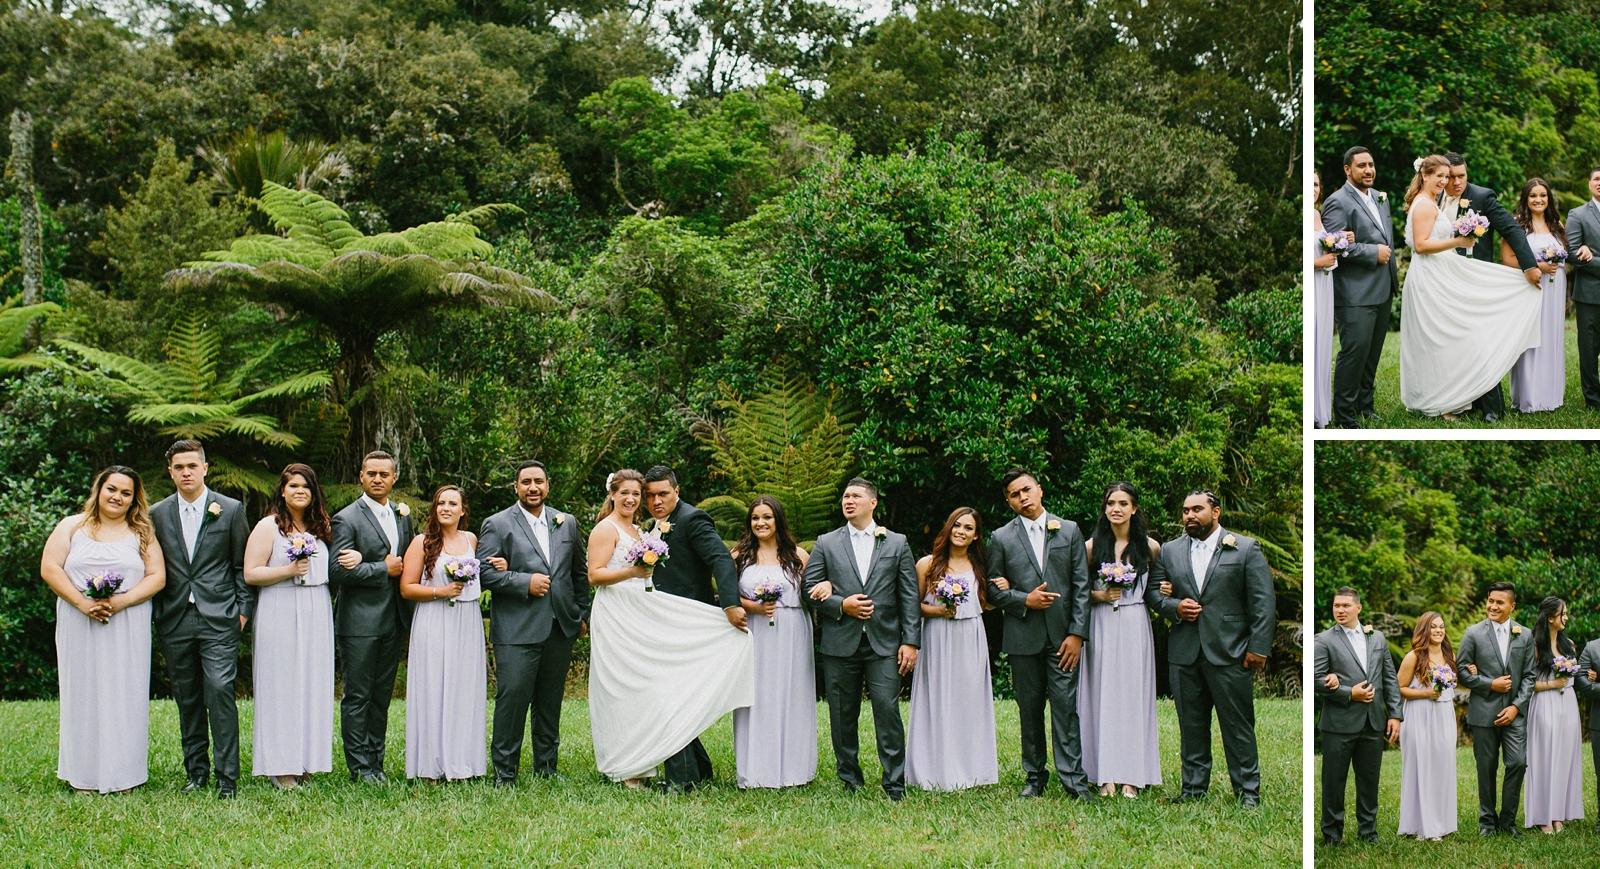 GabbyFiti_Auckland Wedding Photographer_Patty Lagera_0044.jpg